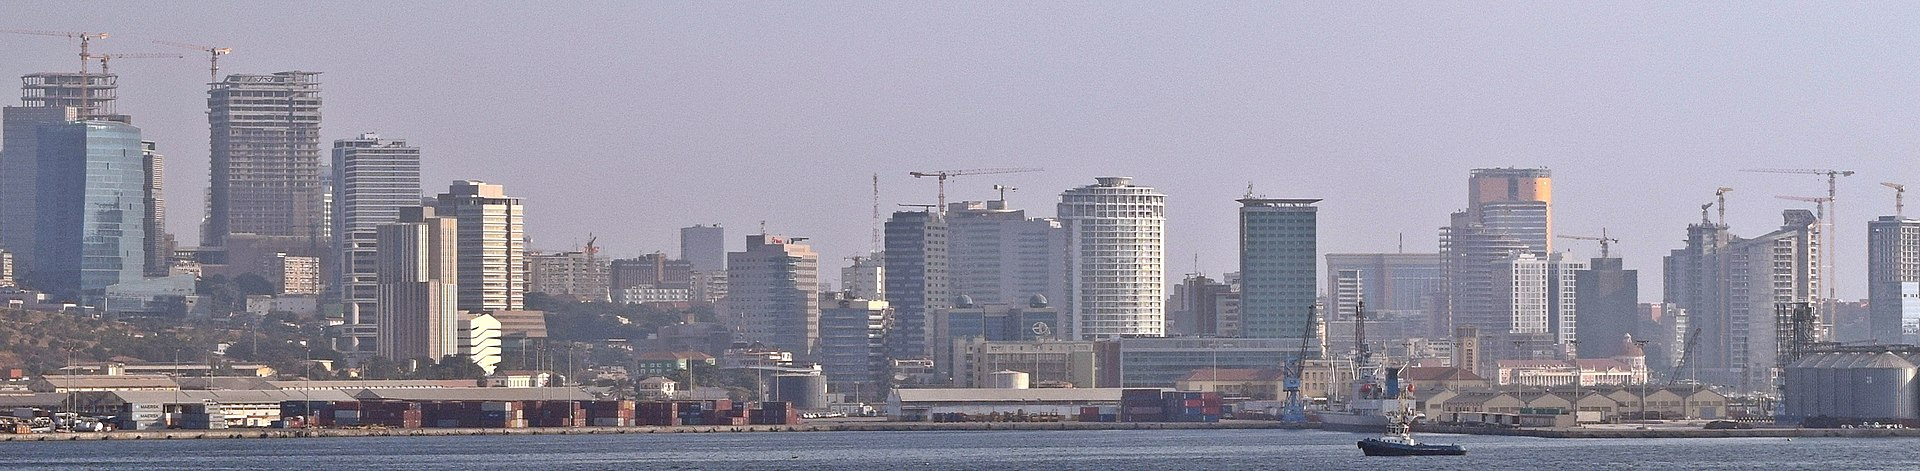 Luanda Bay 5 - panoramio (cropped).jpg